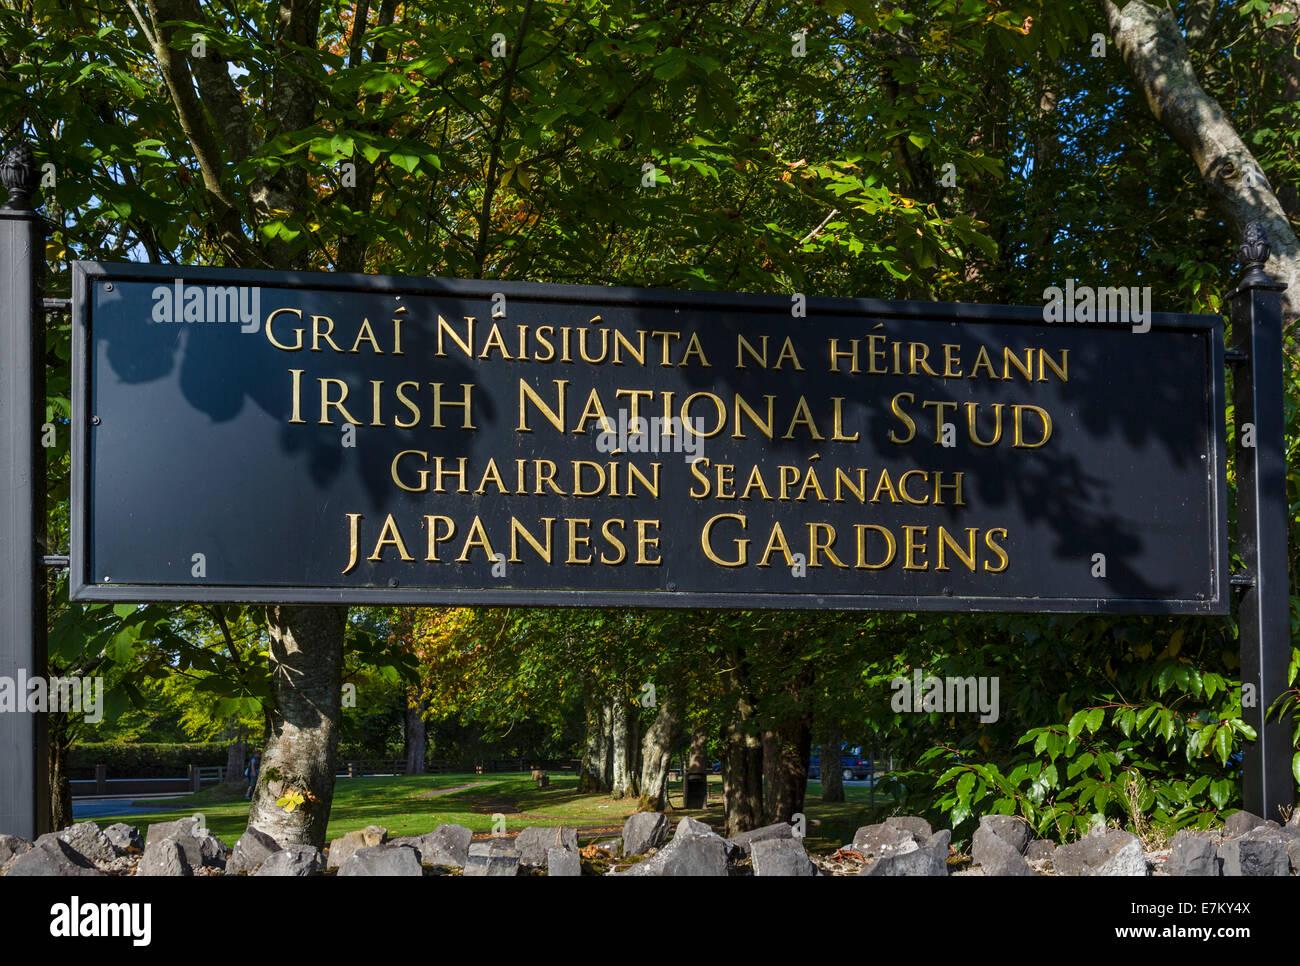 Entrance to the Irish National Stud breeding facility, Tully, Kildare, County Kildare, Republic of Ireland - Stock Image